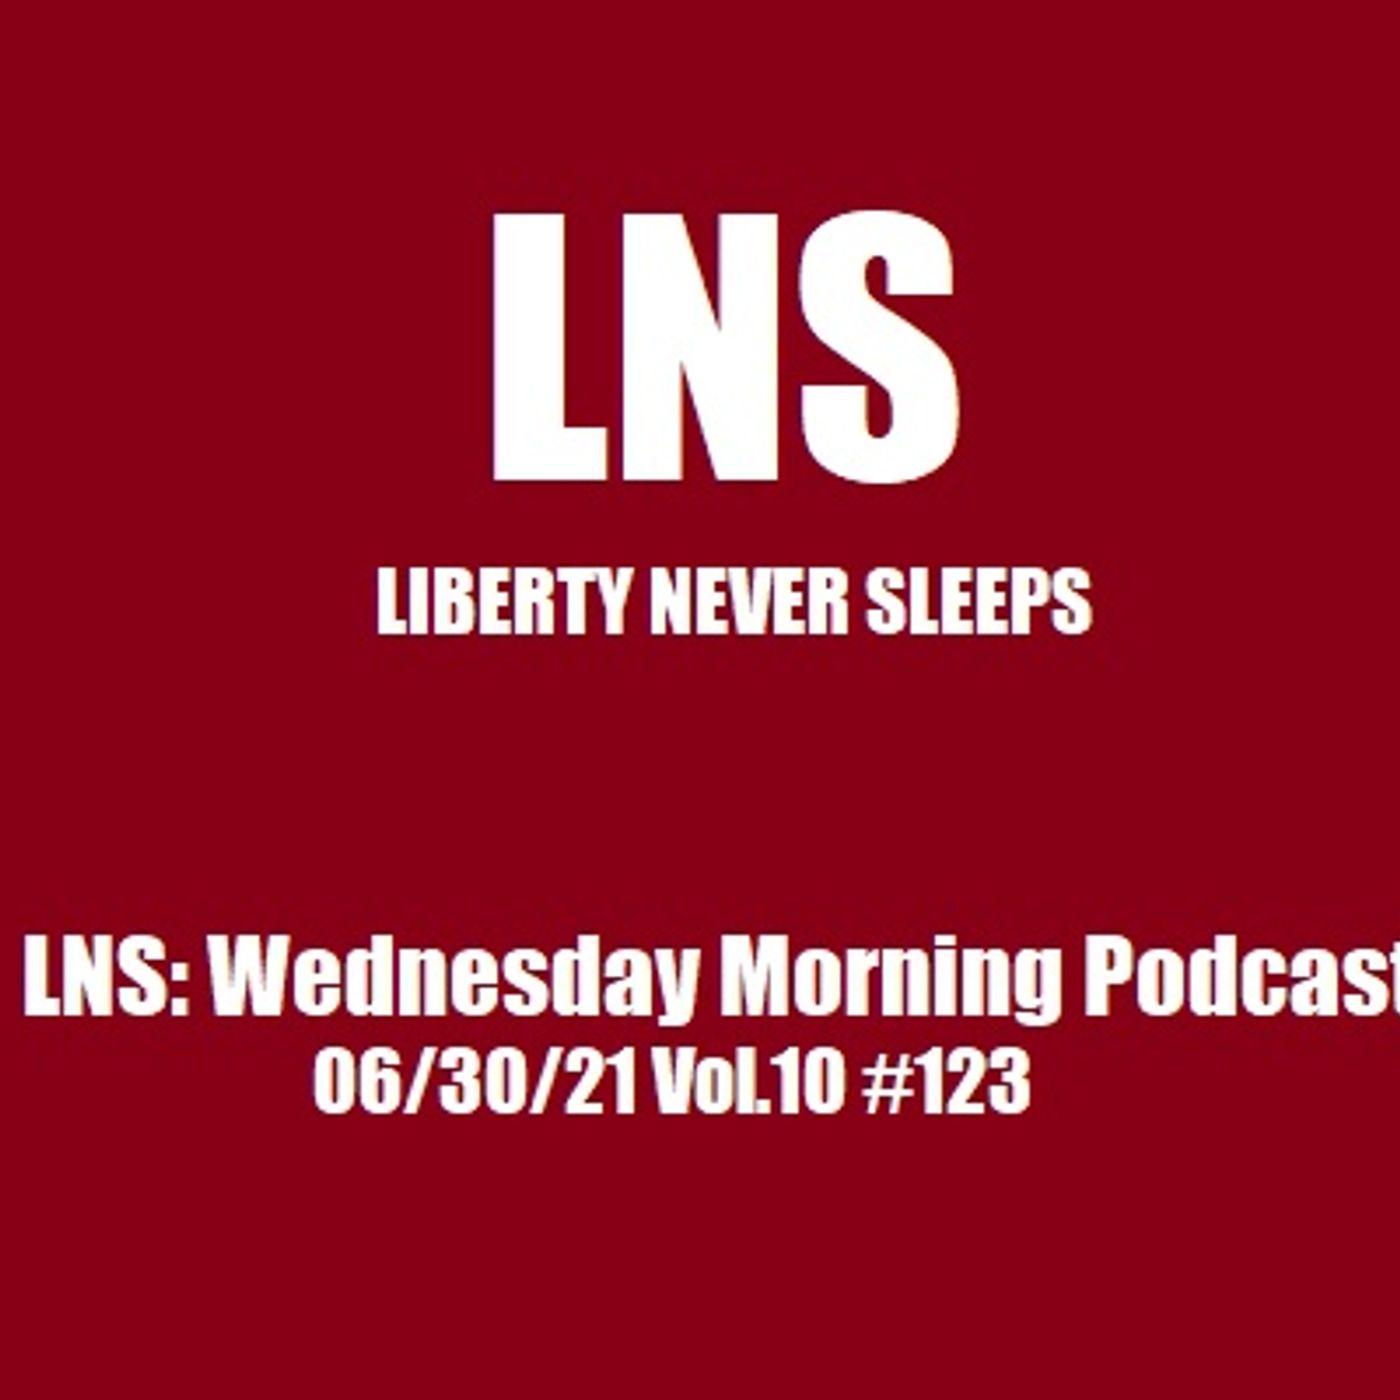 LNS: Wednesday Morning Podcast 06/30/21 Vol.10 #123